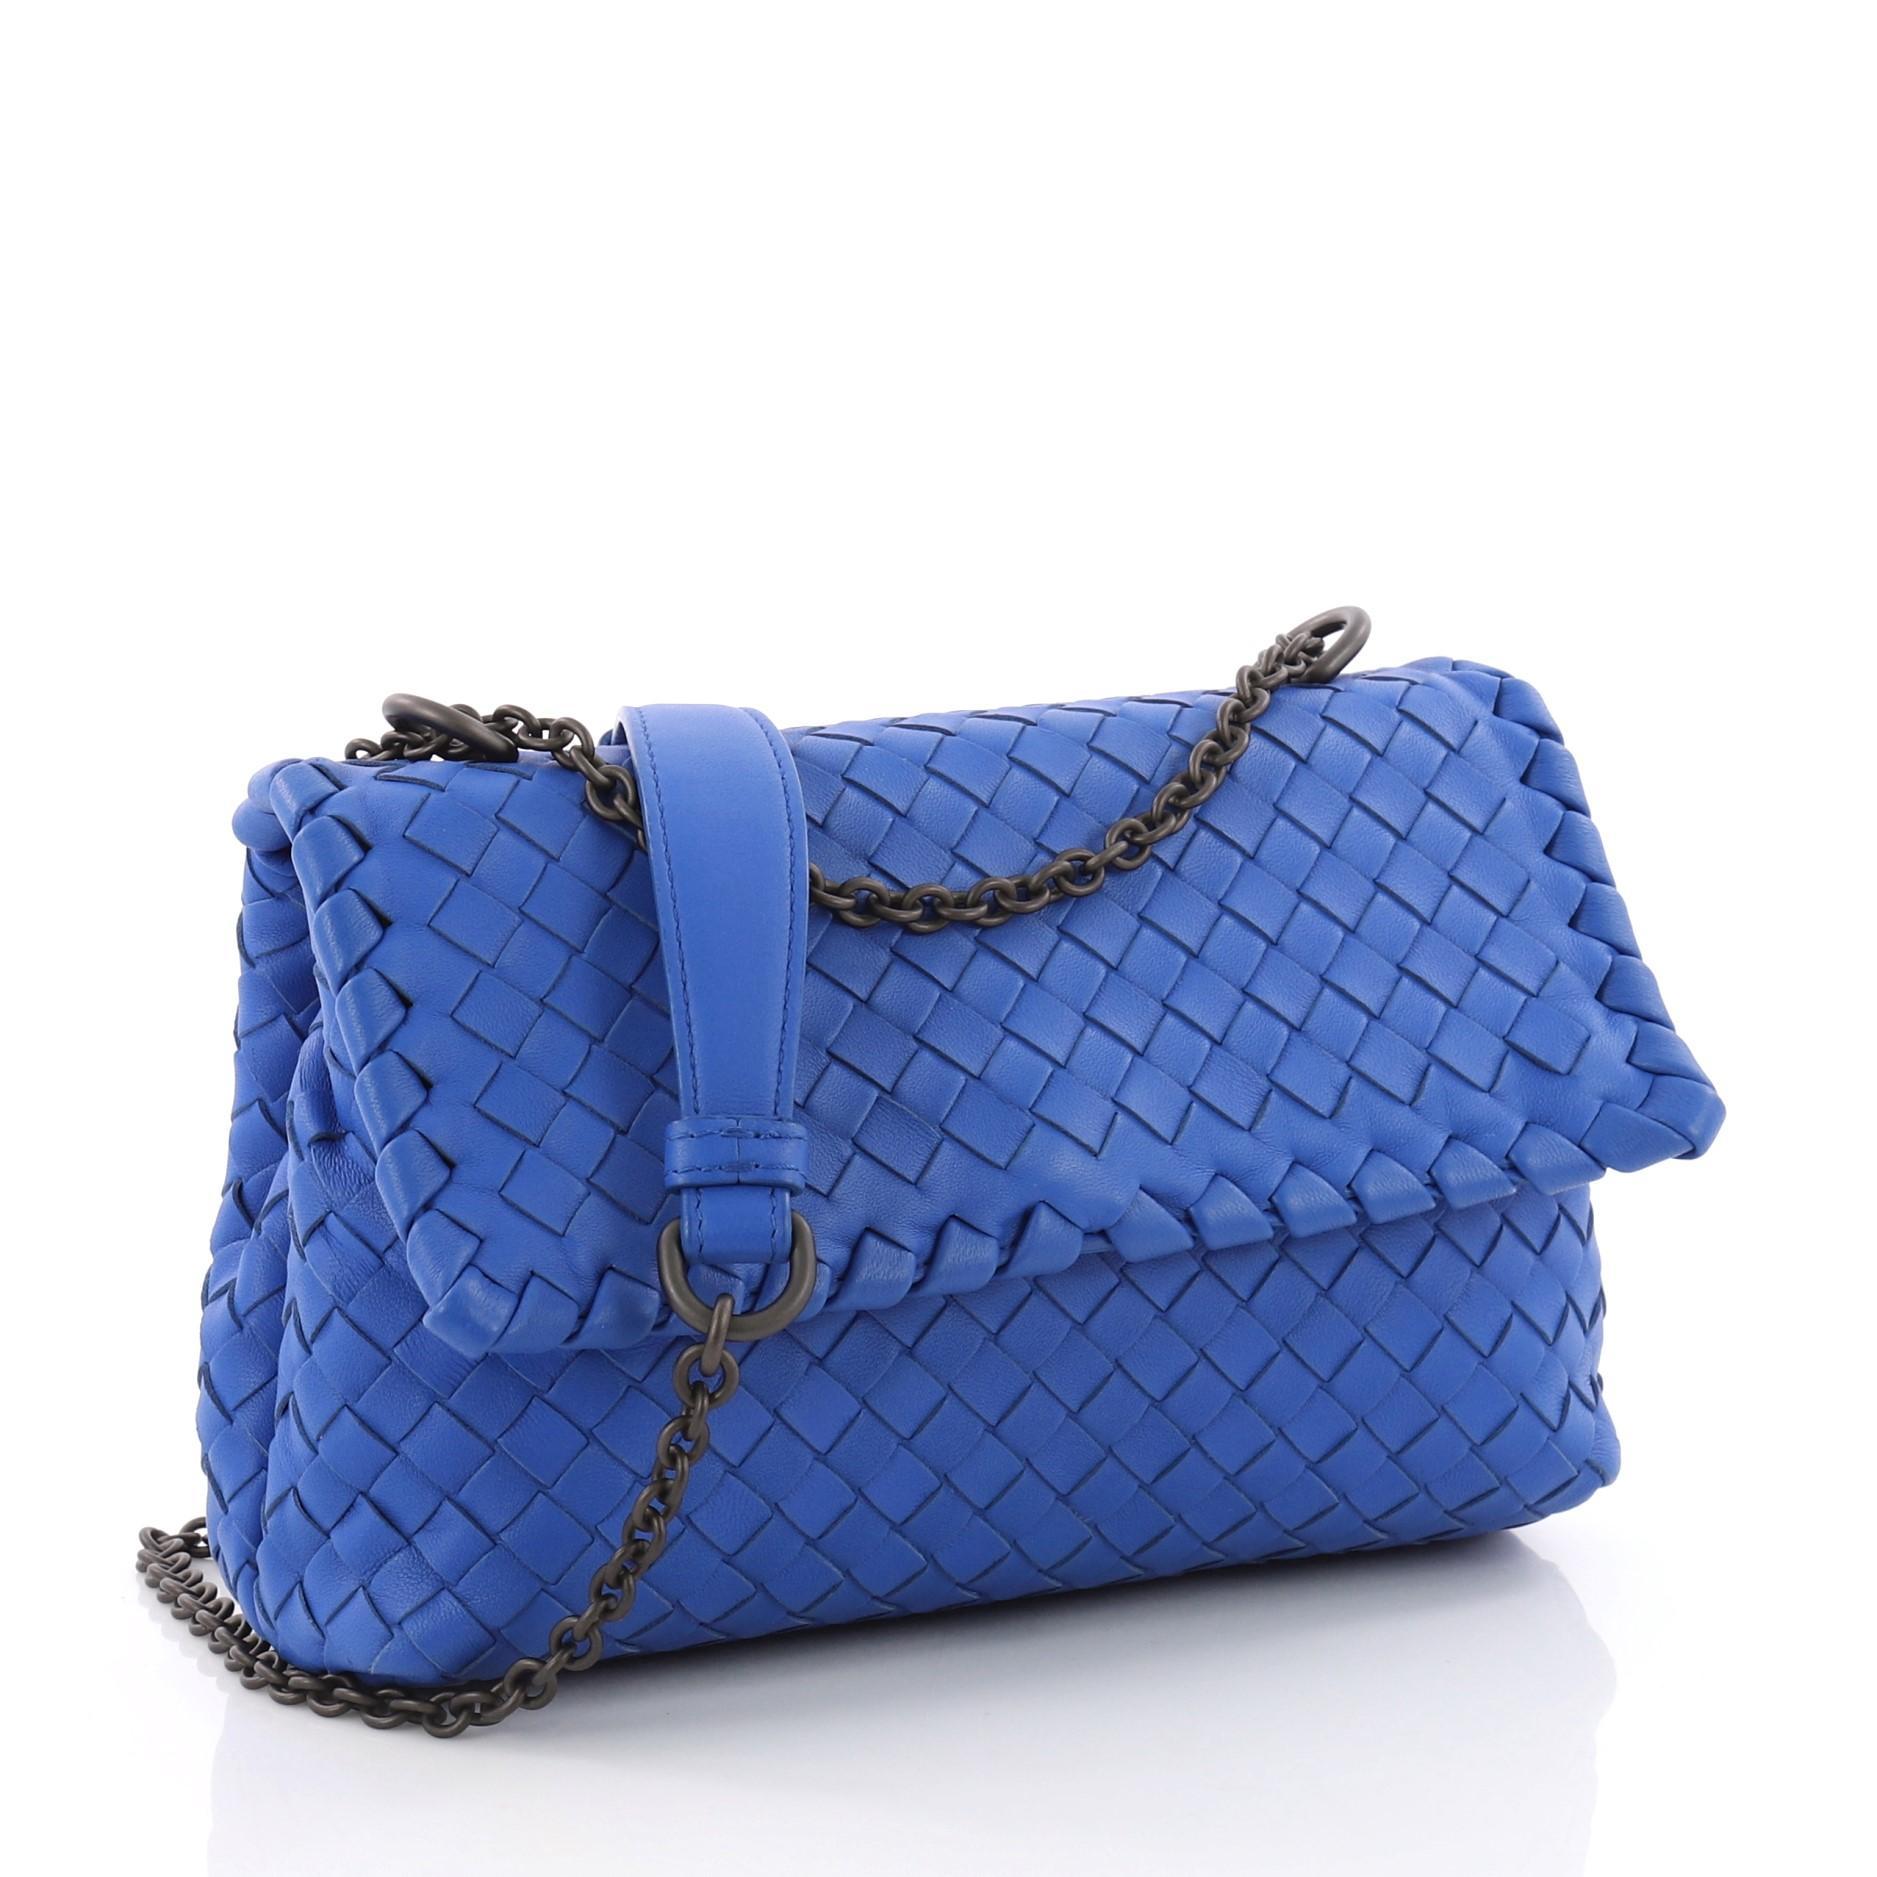 9a5bf3b731 Bottega Veneta Olimpia Crossbody Bag Intrecciato Nappa Baby at 1stdibs